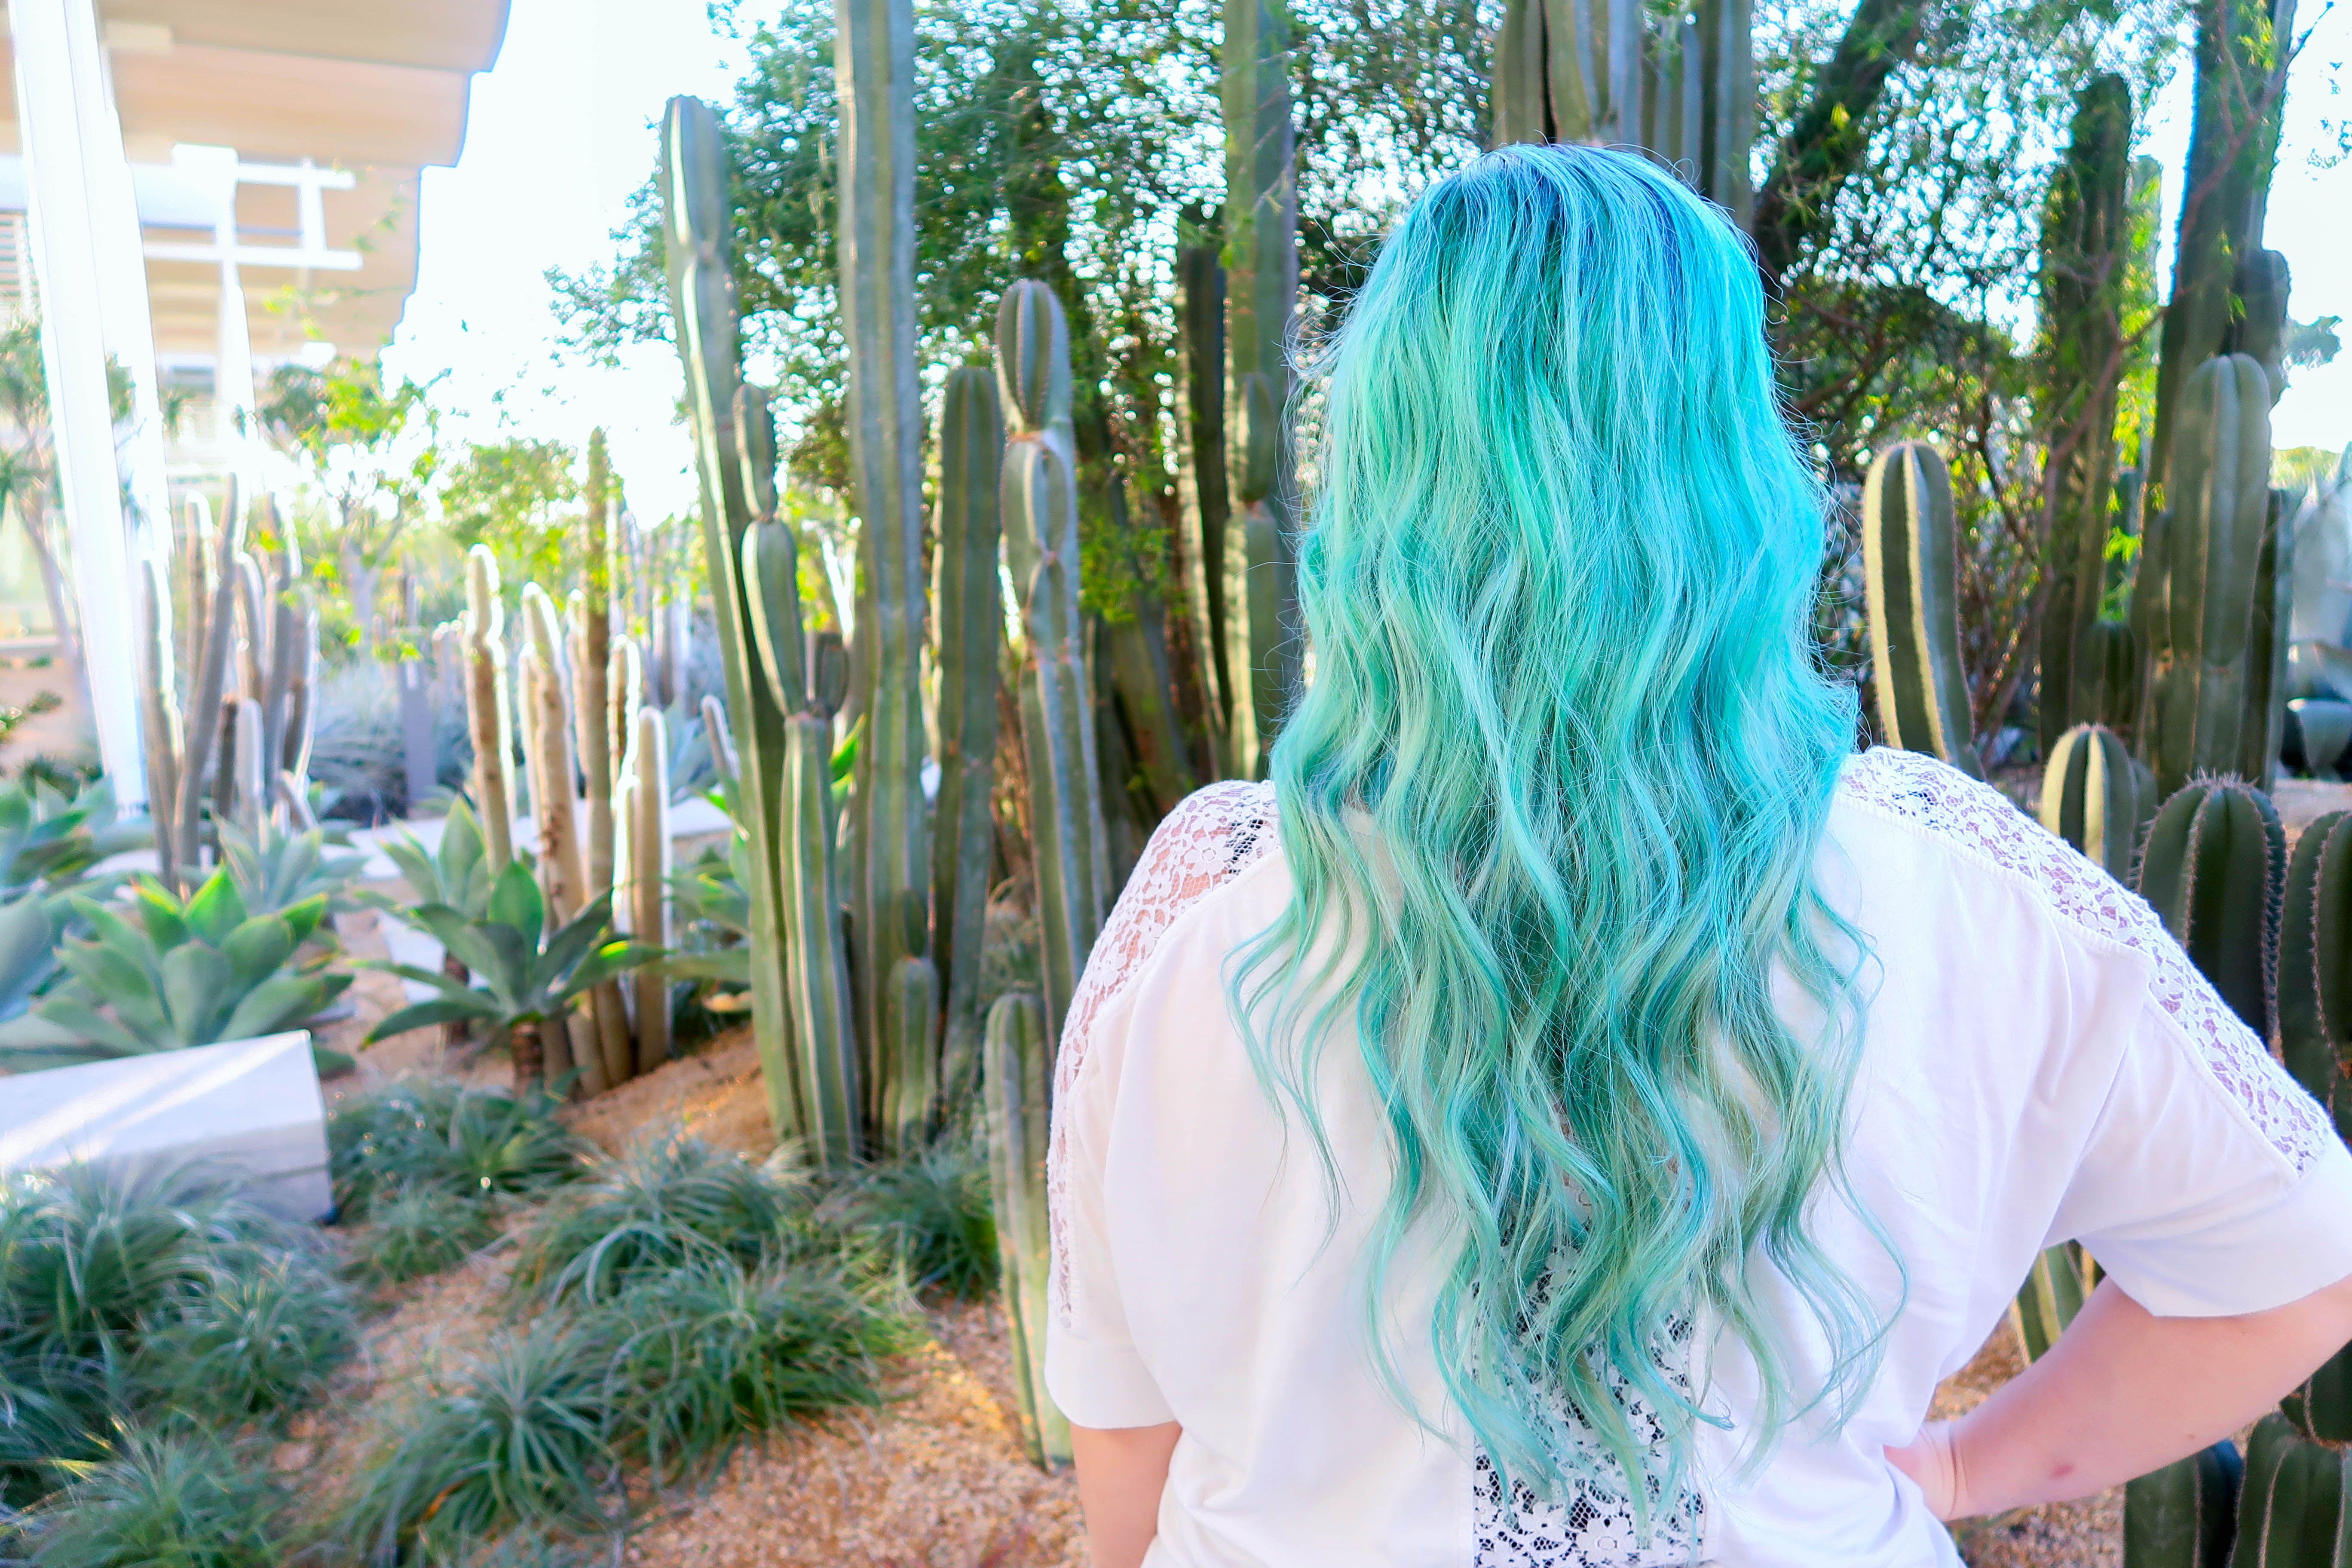 Blue green mermaid hair to dye for pinterest hair dye and hair